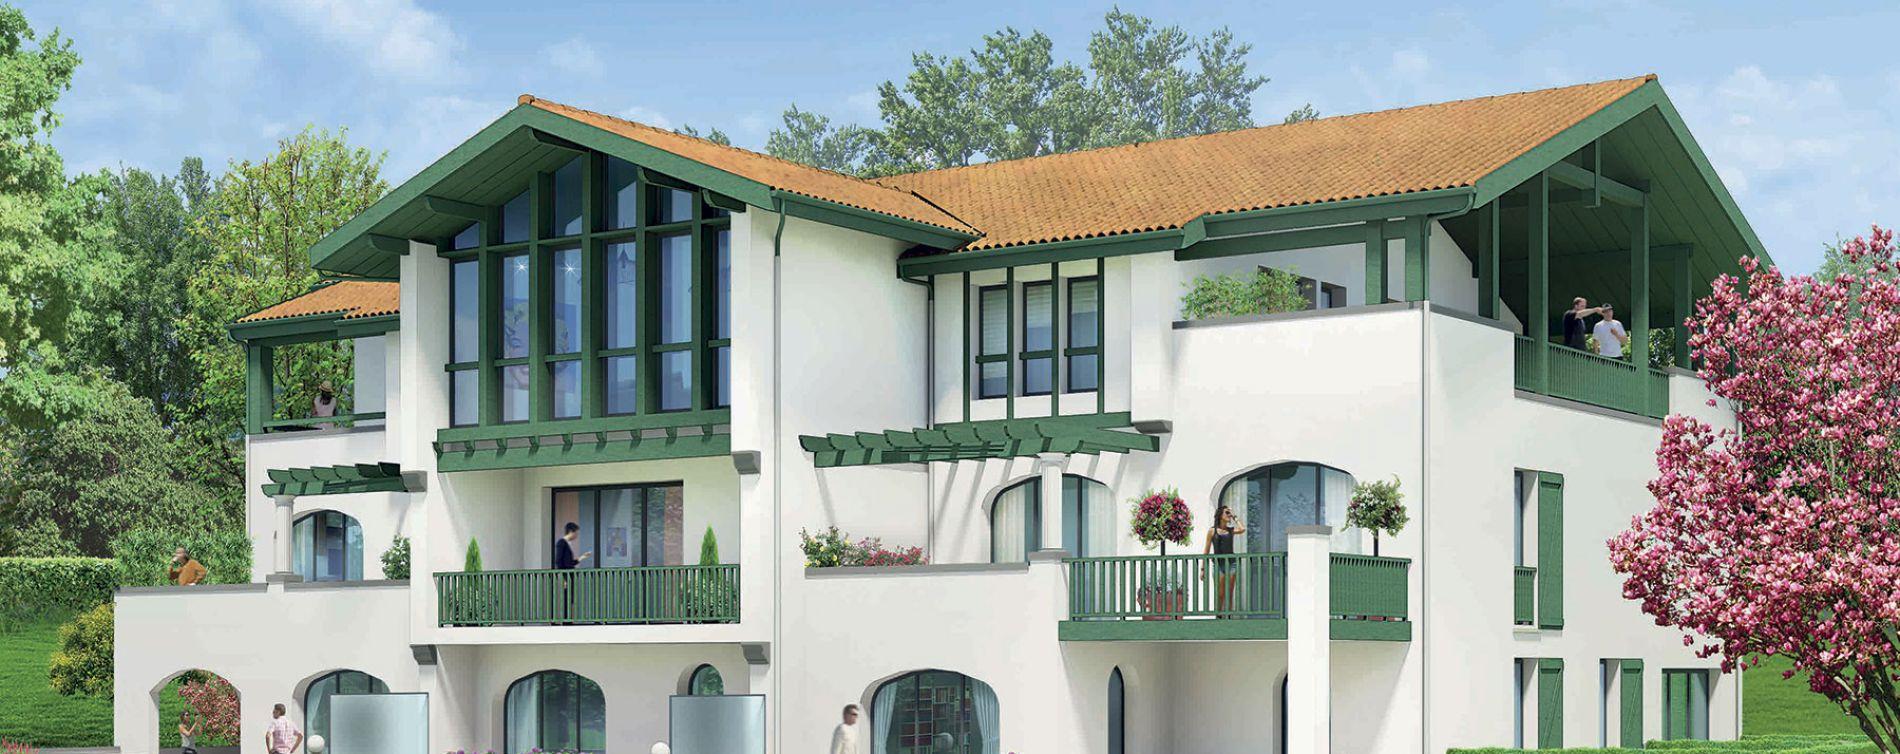 Résidence Villa Grammont à Biarritz